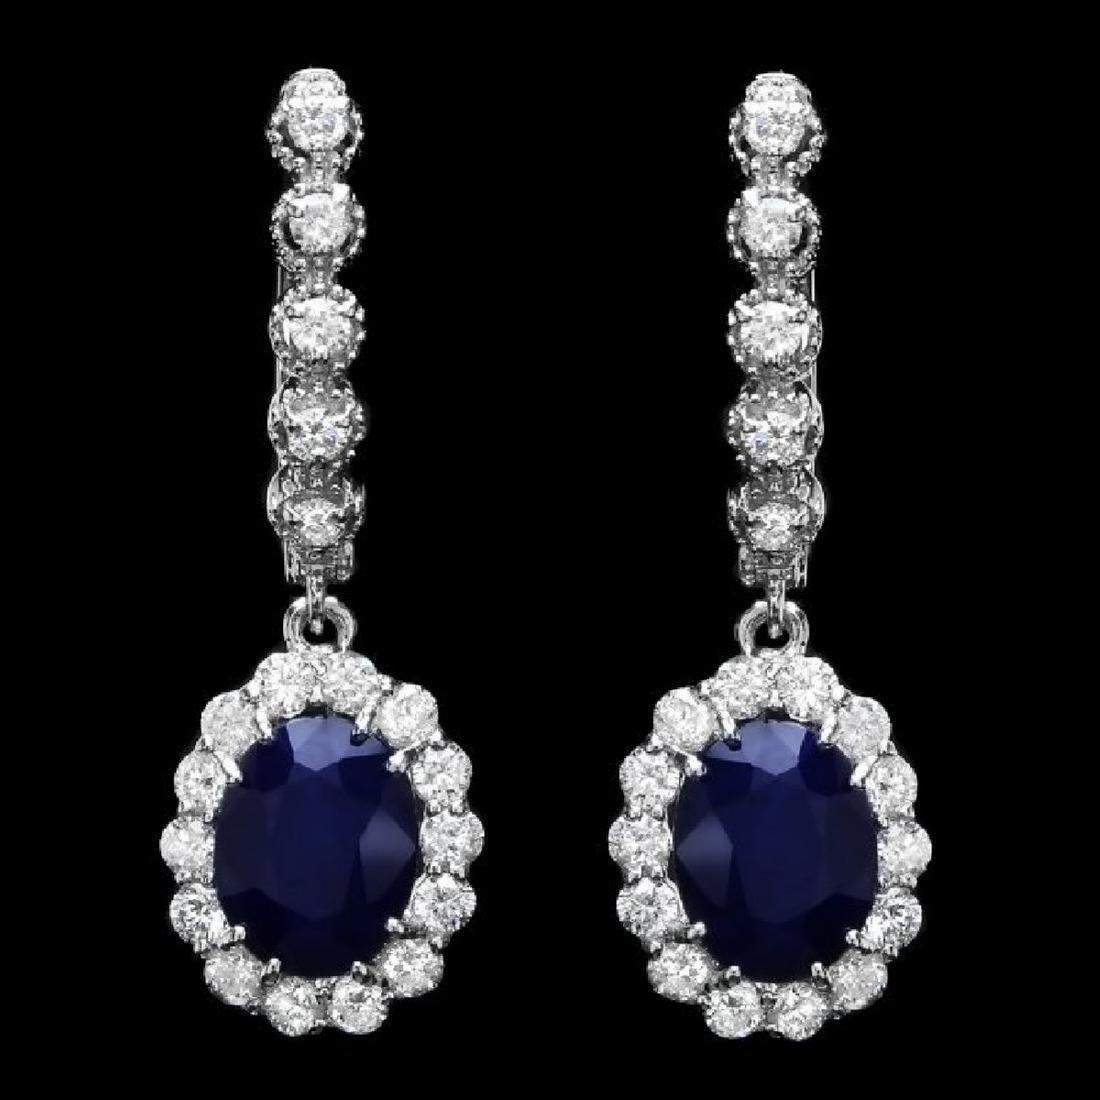 14K Gold 6.35 Ct Sapphire Diamond Dangling Earrings